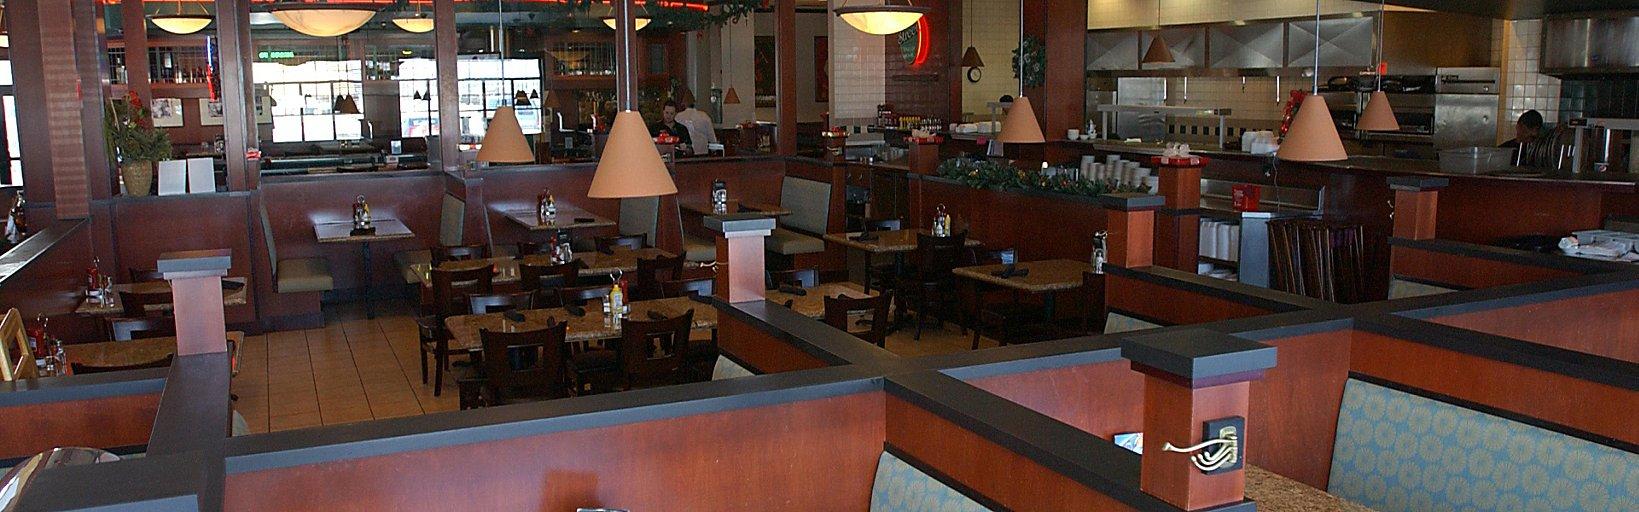 Holiday Inn Hotel Suites Owatonna